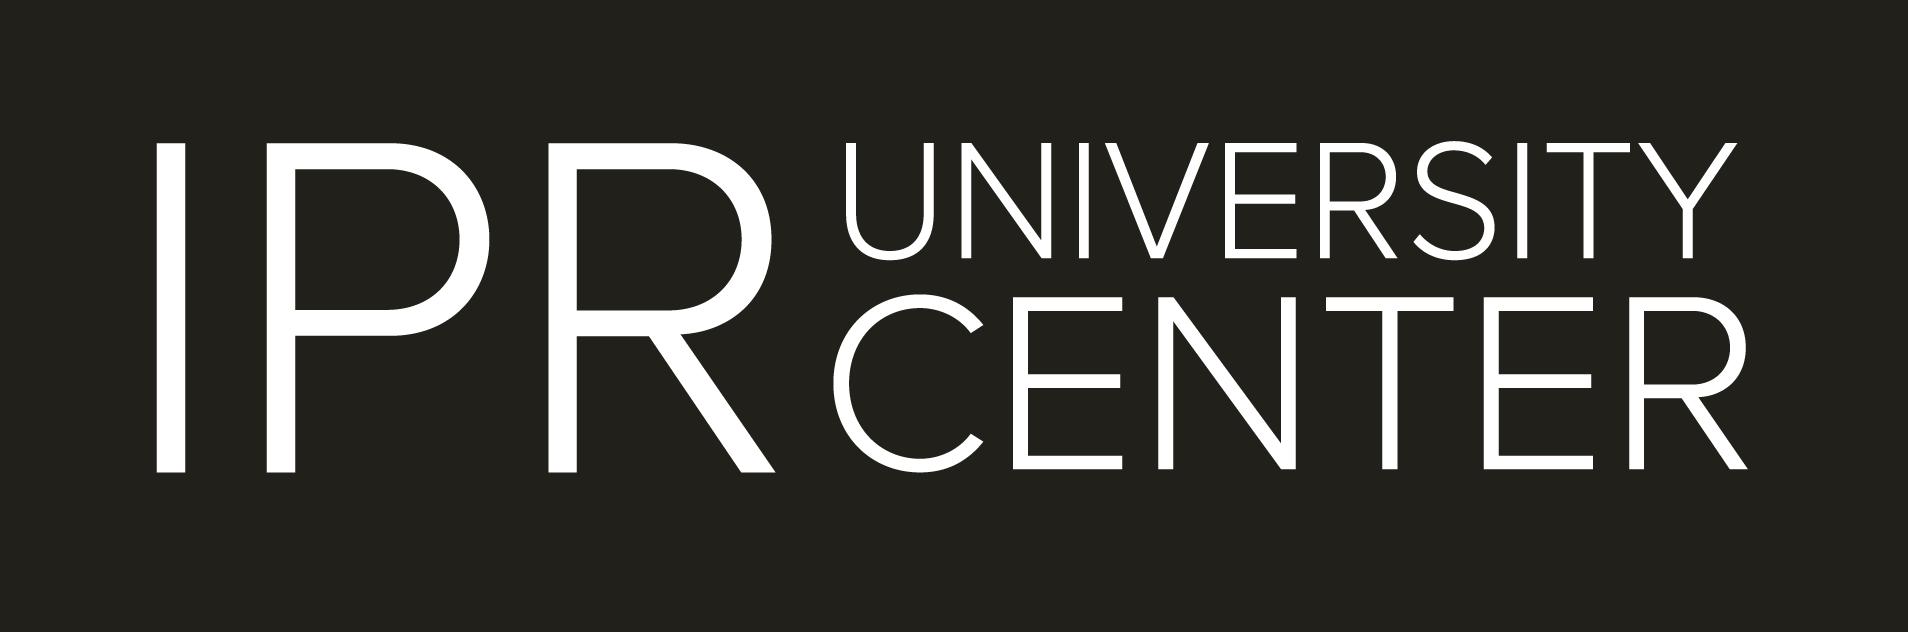 IPR-University-Center-logo-rgb